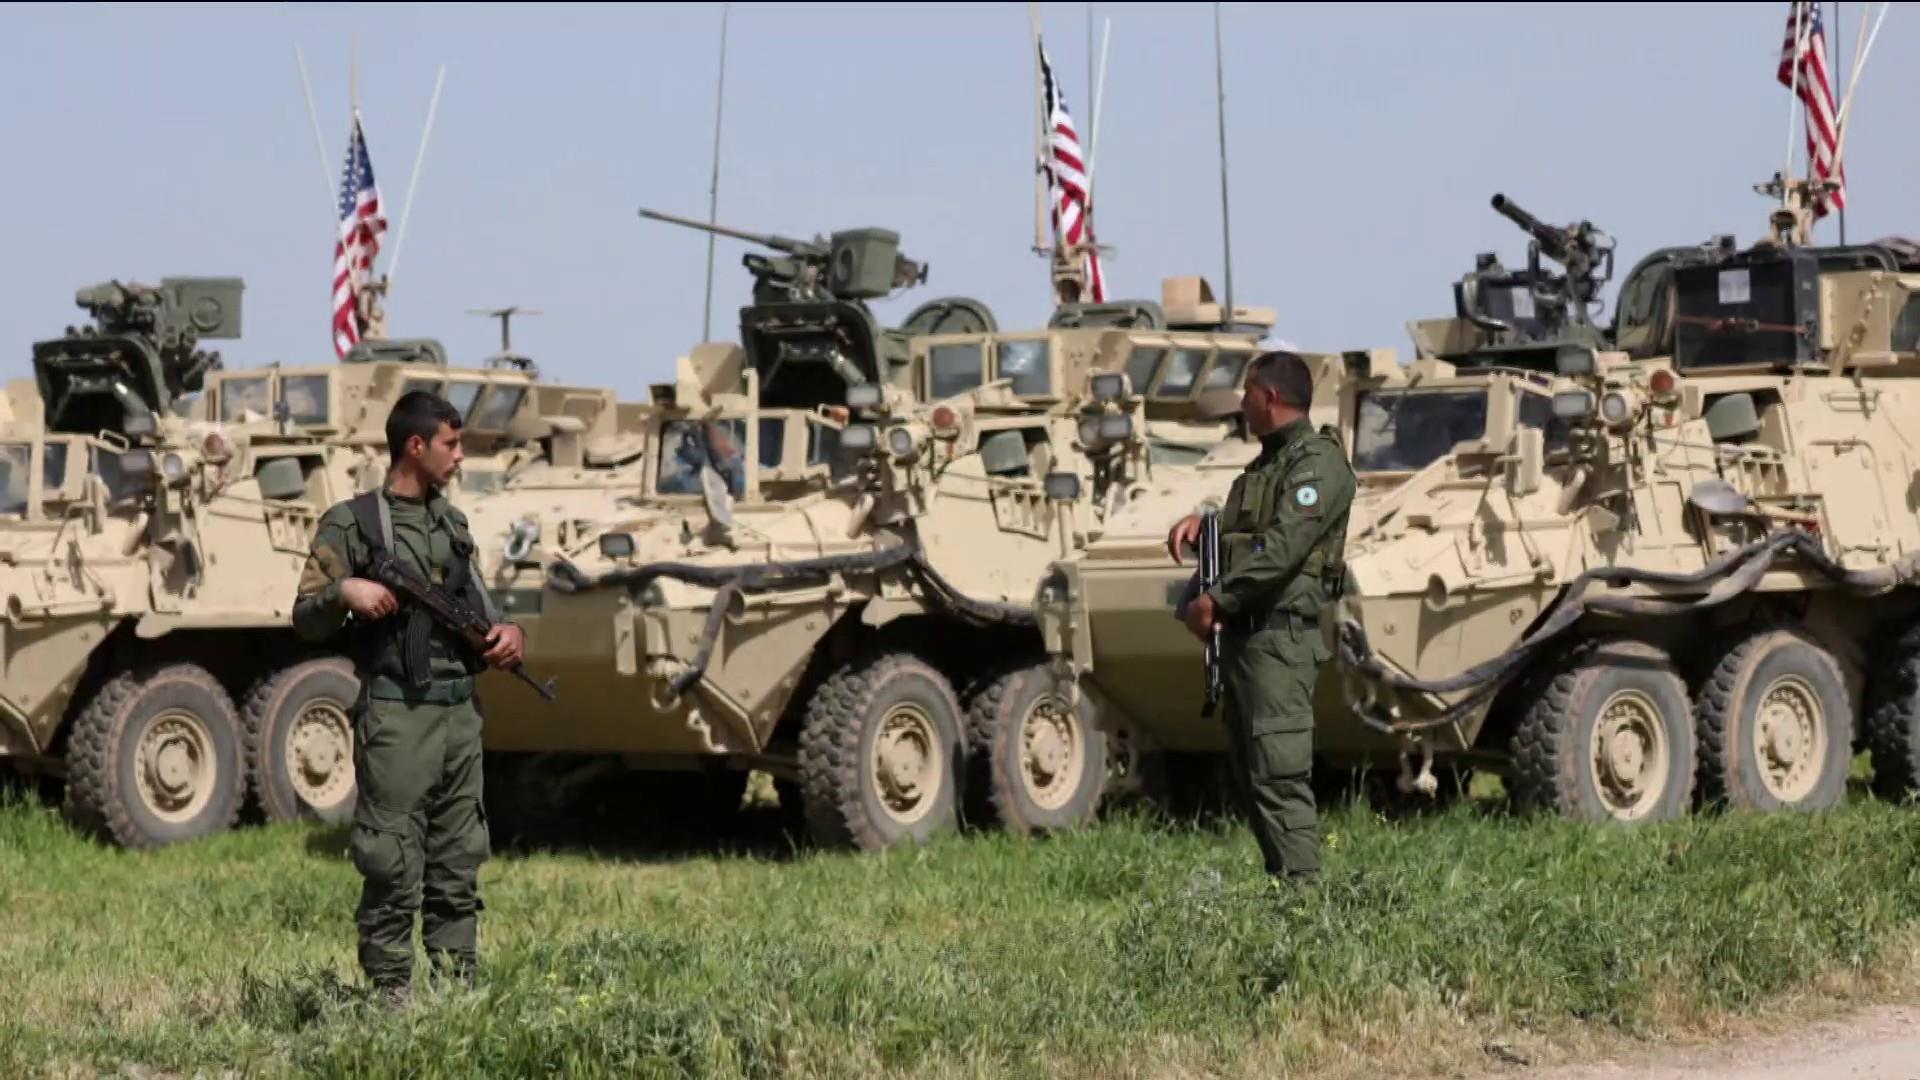 Turkey continues Syria offensive despite U.S. sanctions